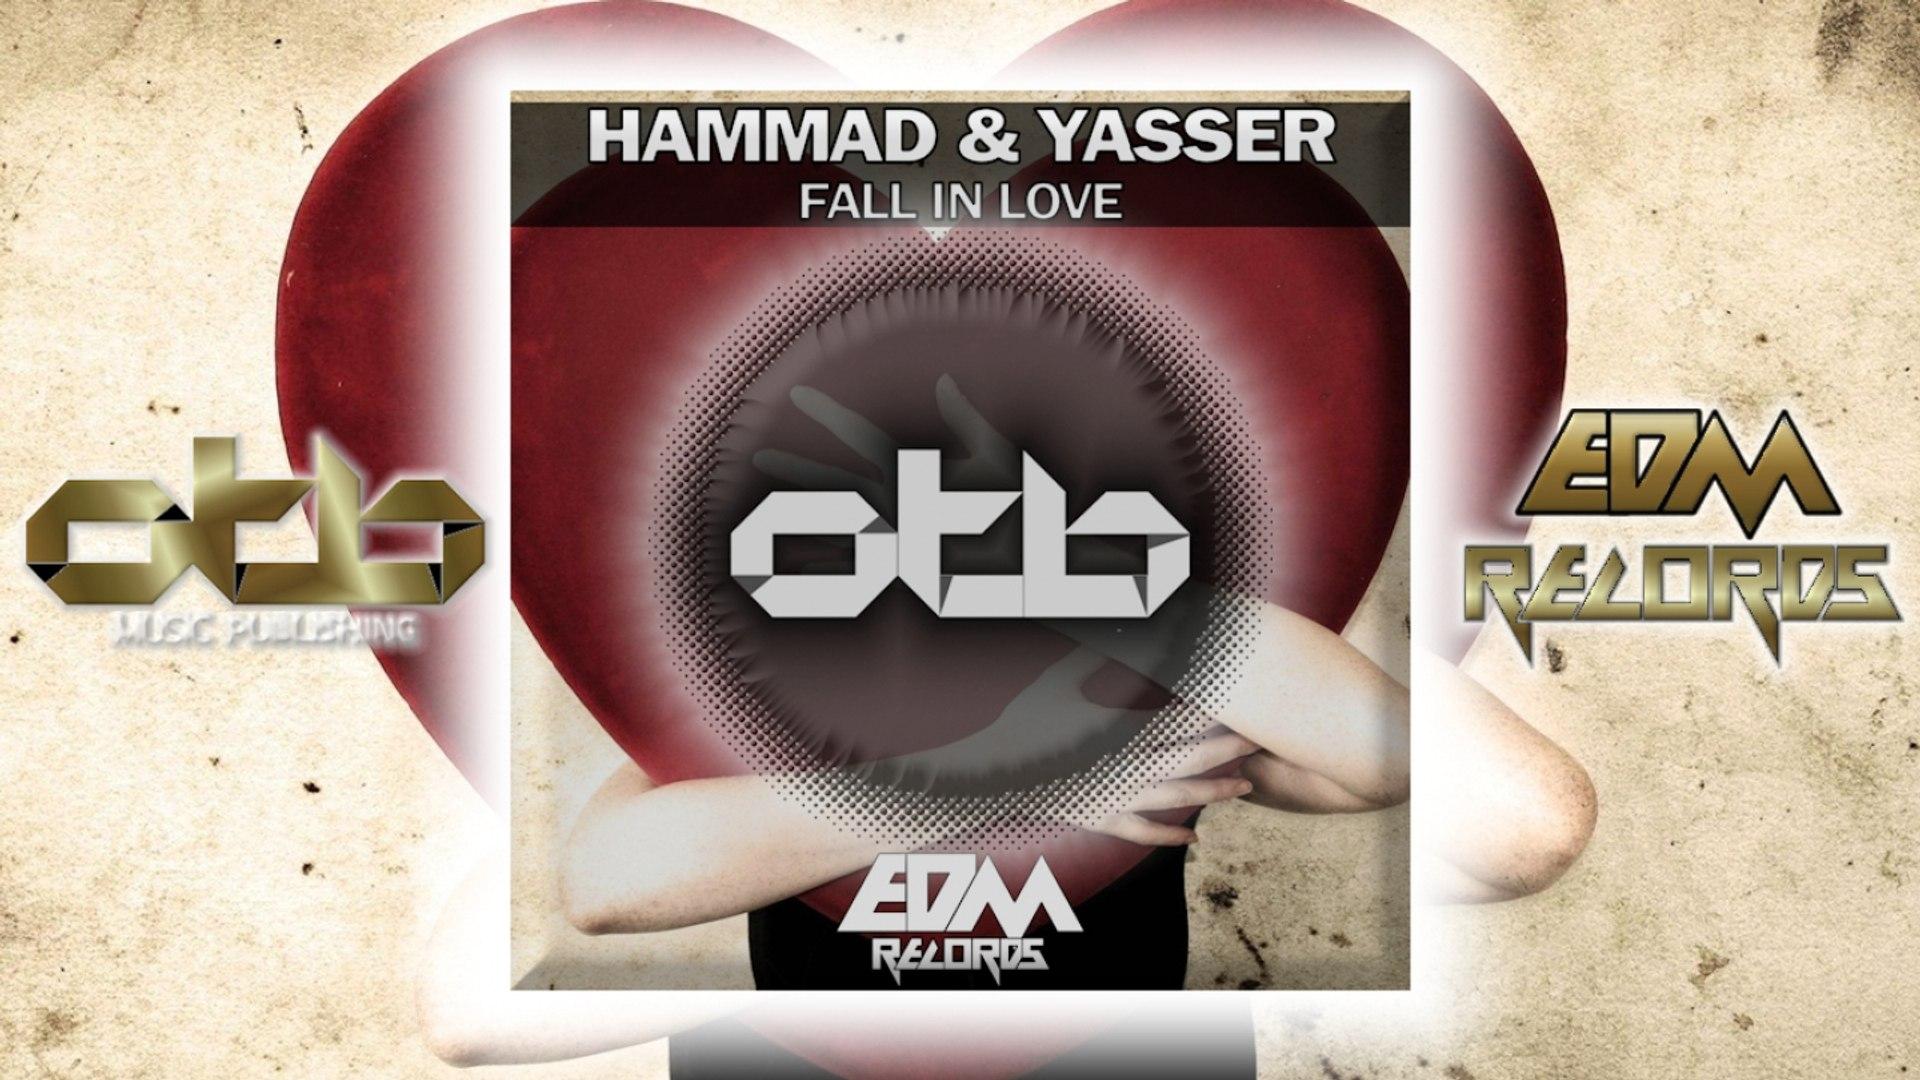 Hammad, Yasser - Fall in Love - [EDM 2018]